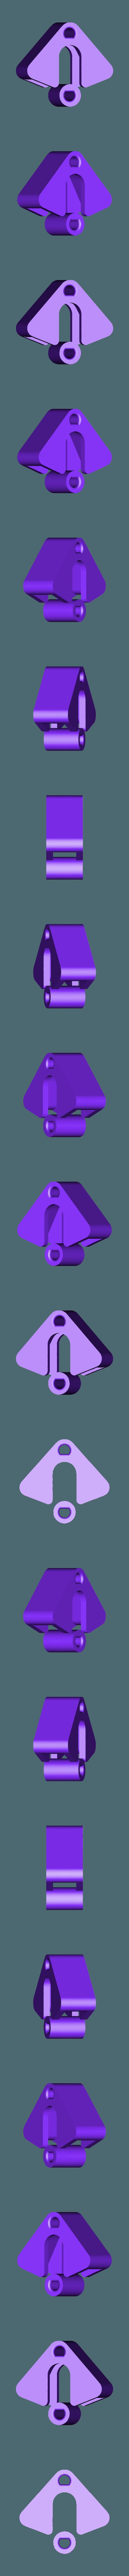 7mm_Ziptie_Belt_Tensioner.stl Download free STL file Minimalist belt tensioner (replaces tensioning springs) • 3D printer model, CartesianCreationsAU